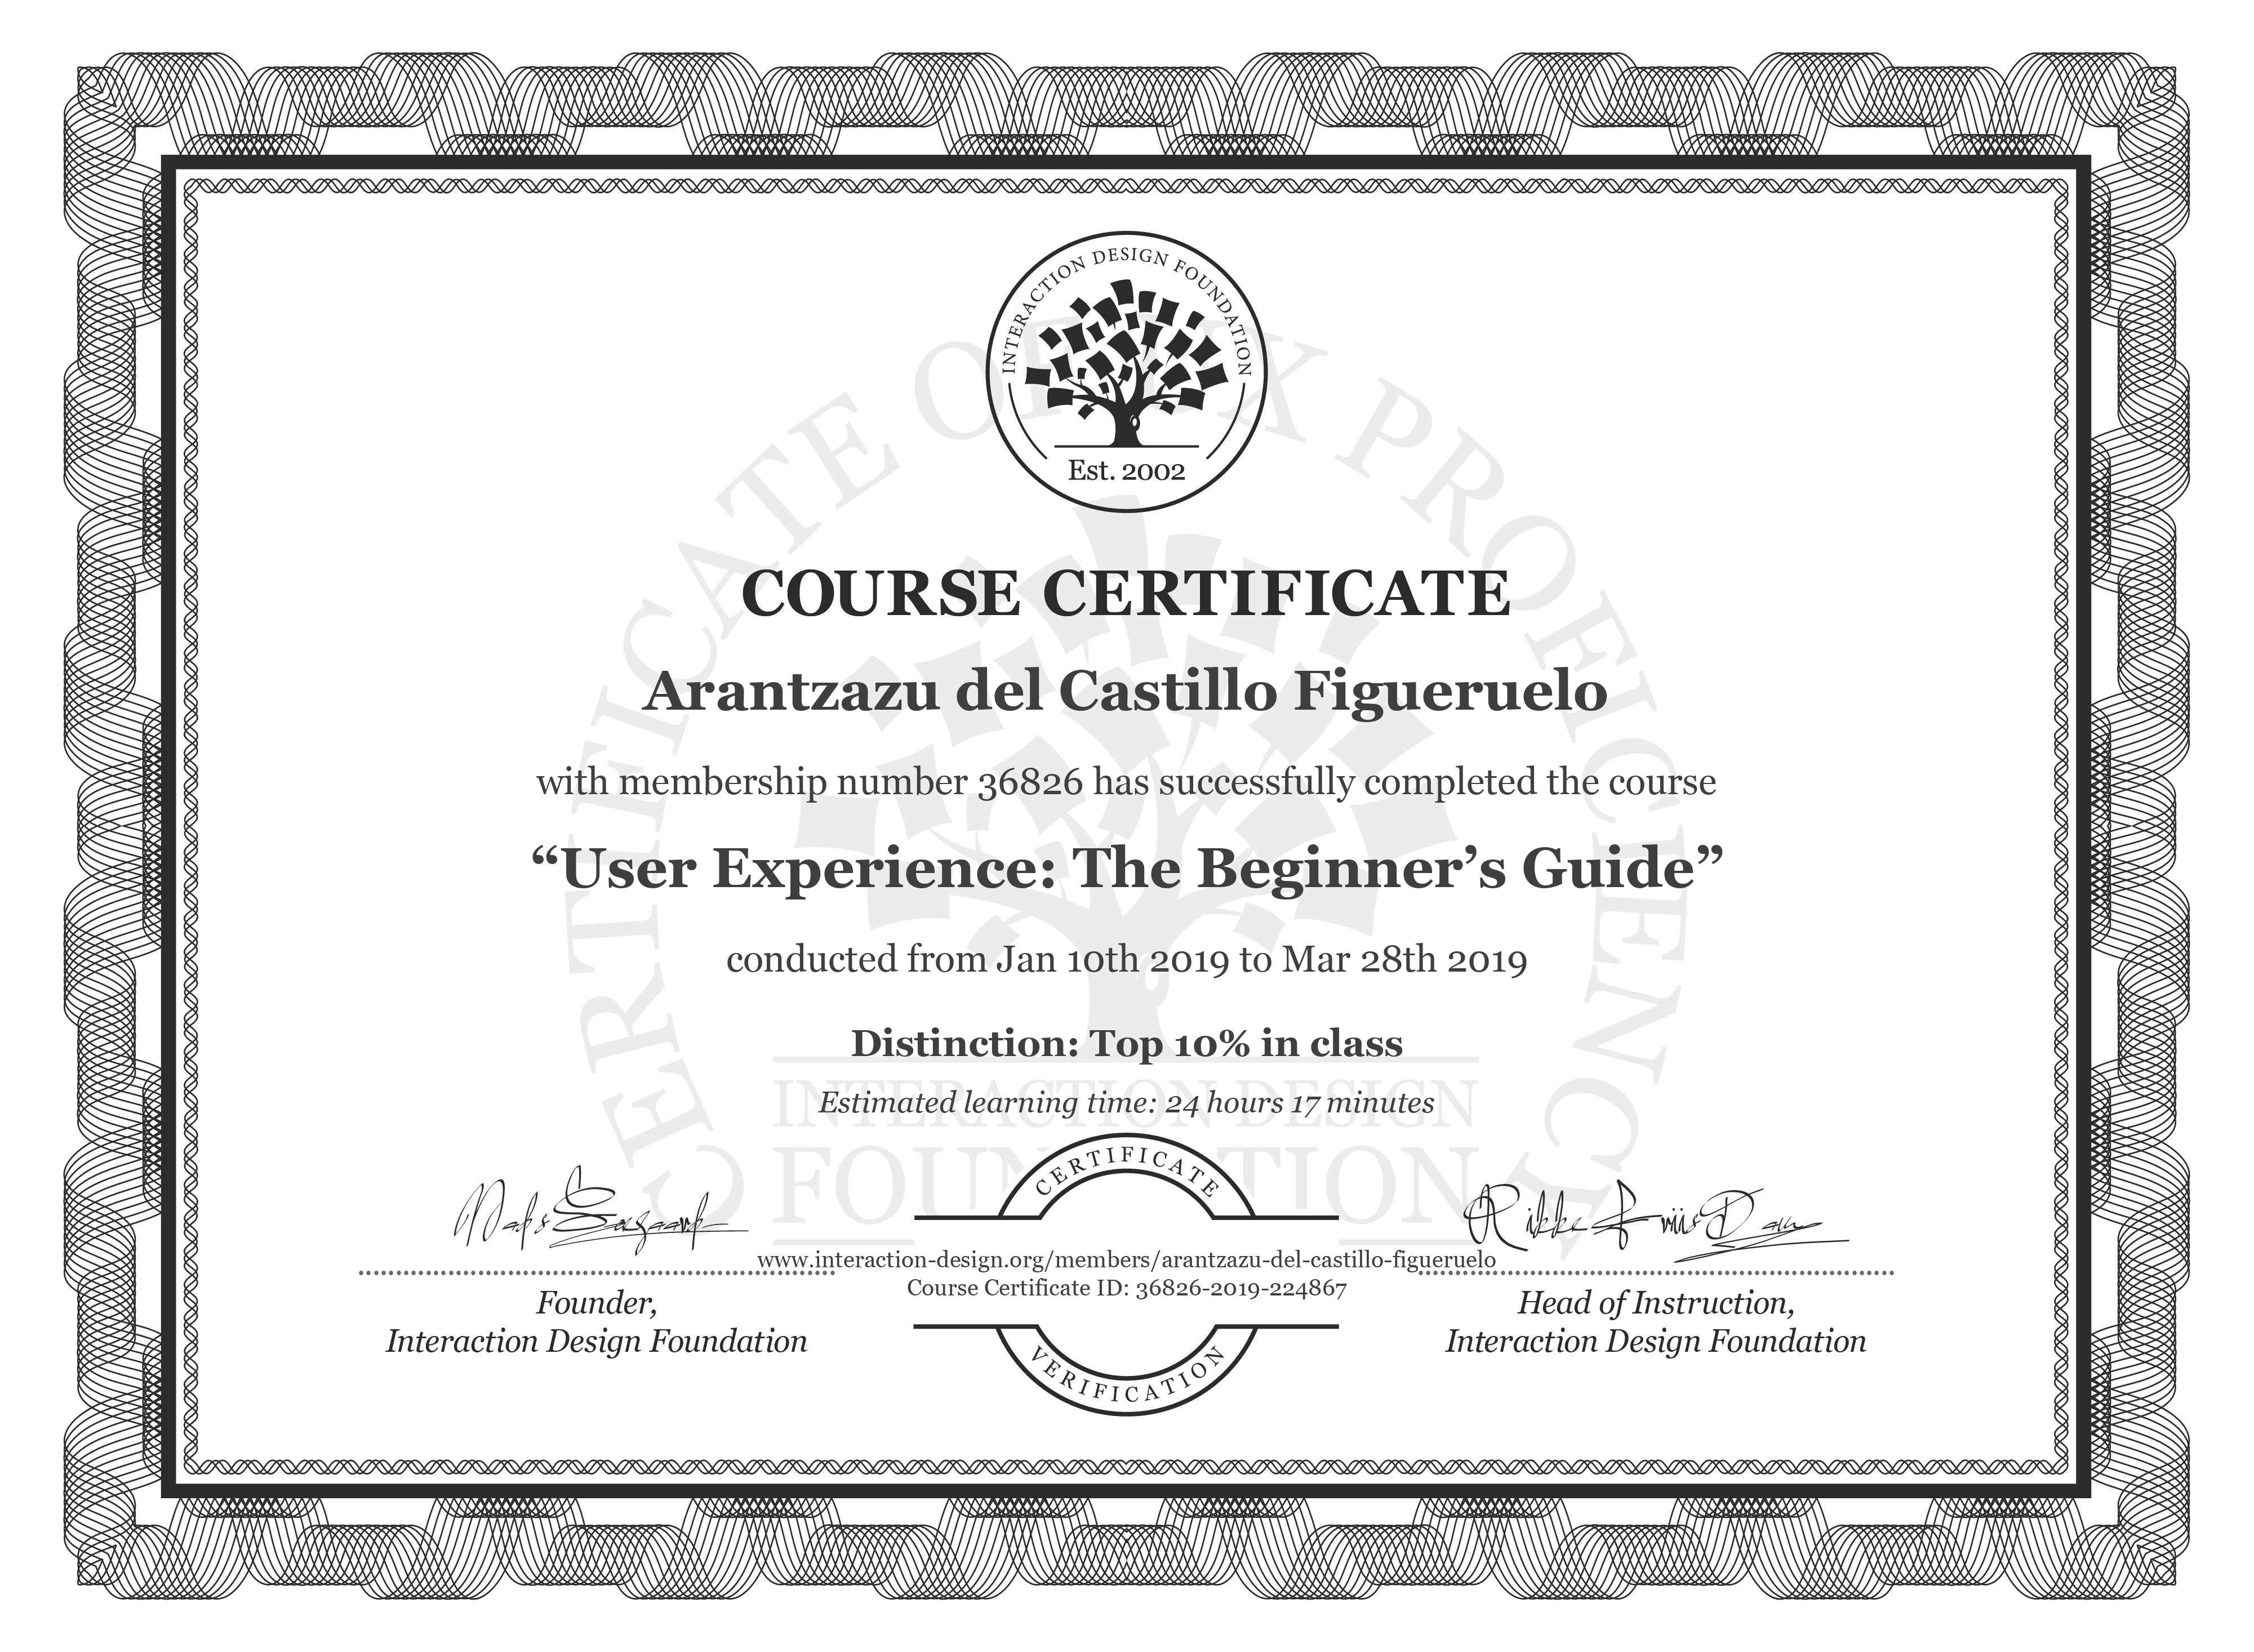 Arantzazu del Castillo Figueruelo's Course Certificate: Become a UX Designer from Scratch